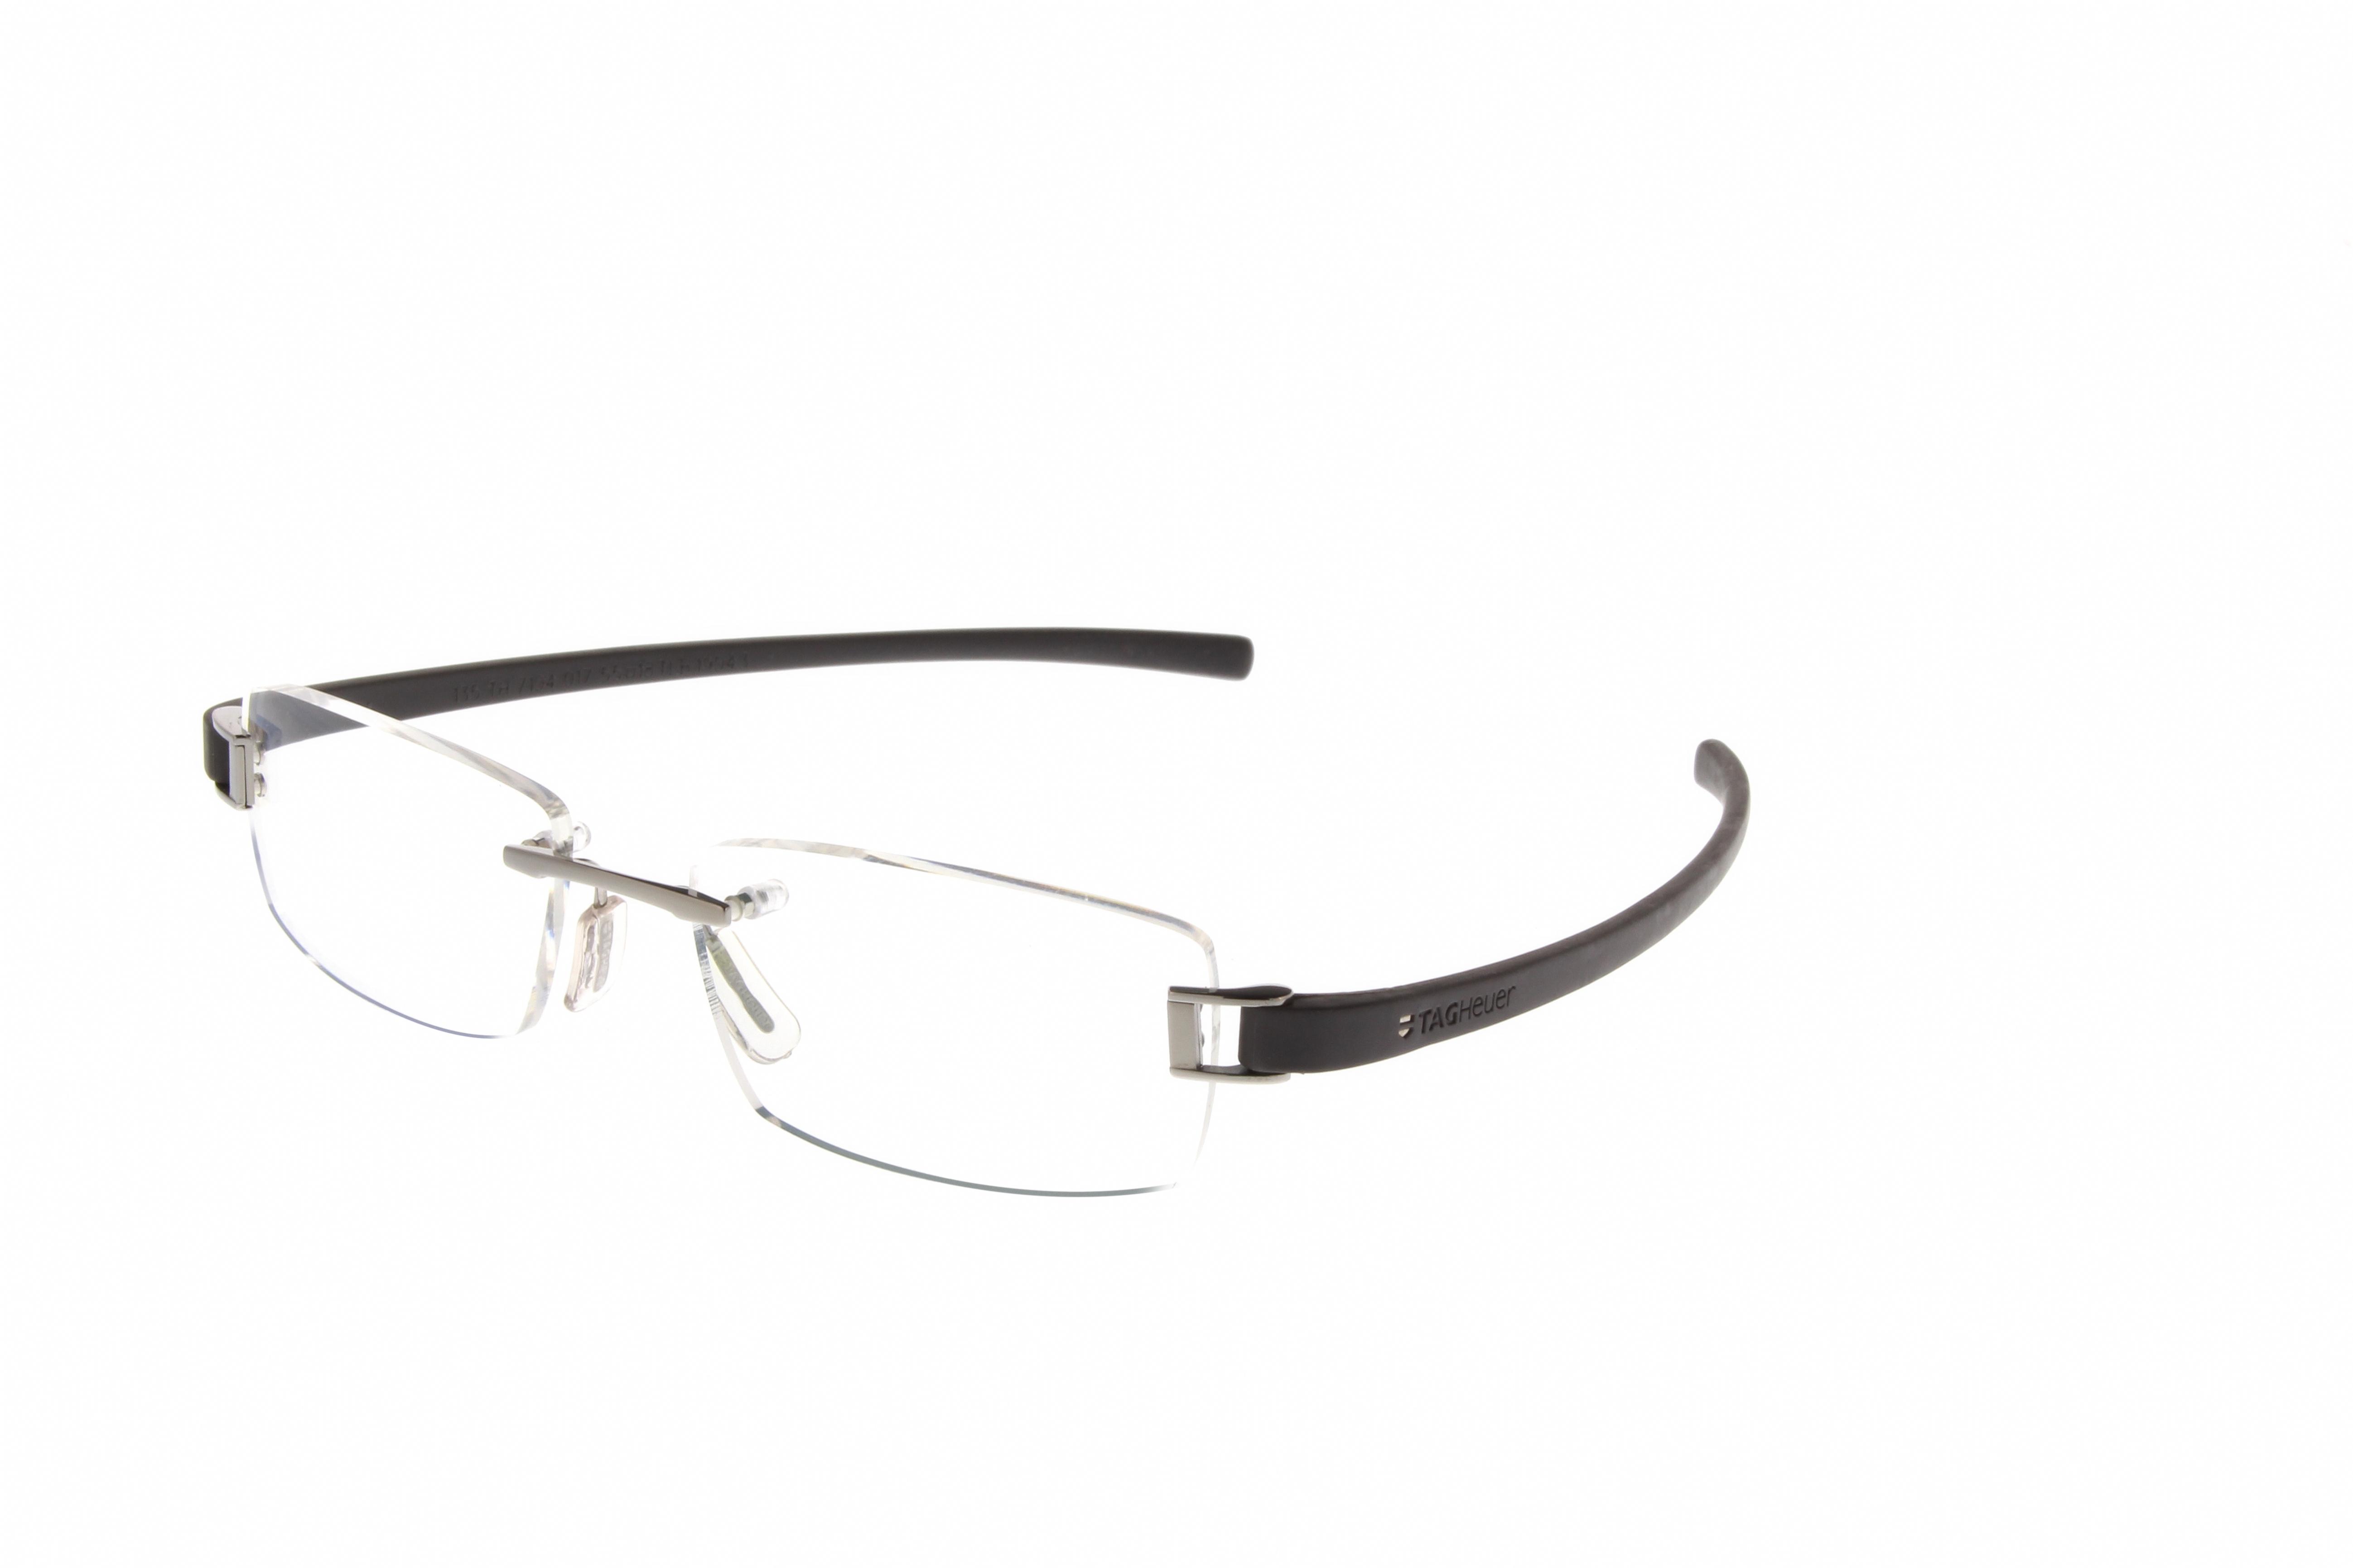 a24c8633d92 Tag Heuer 7104 Eyeglasses